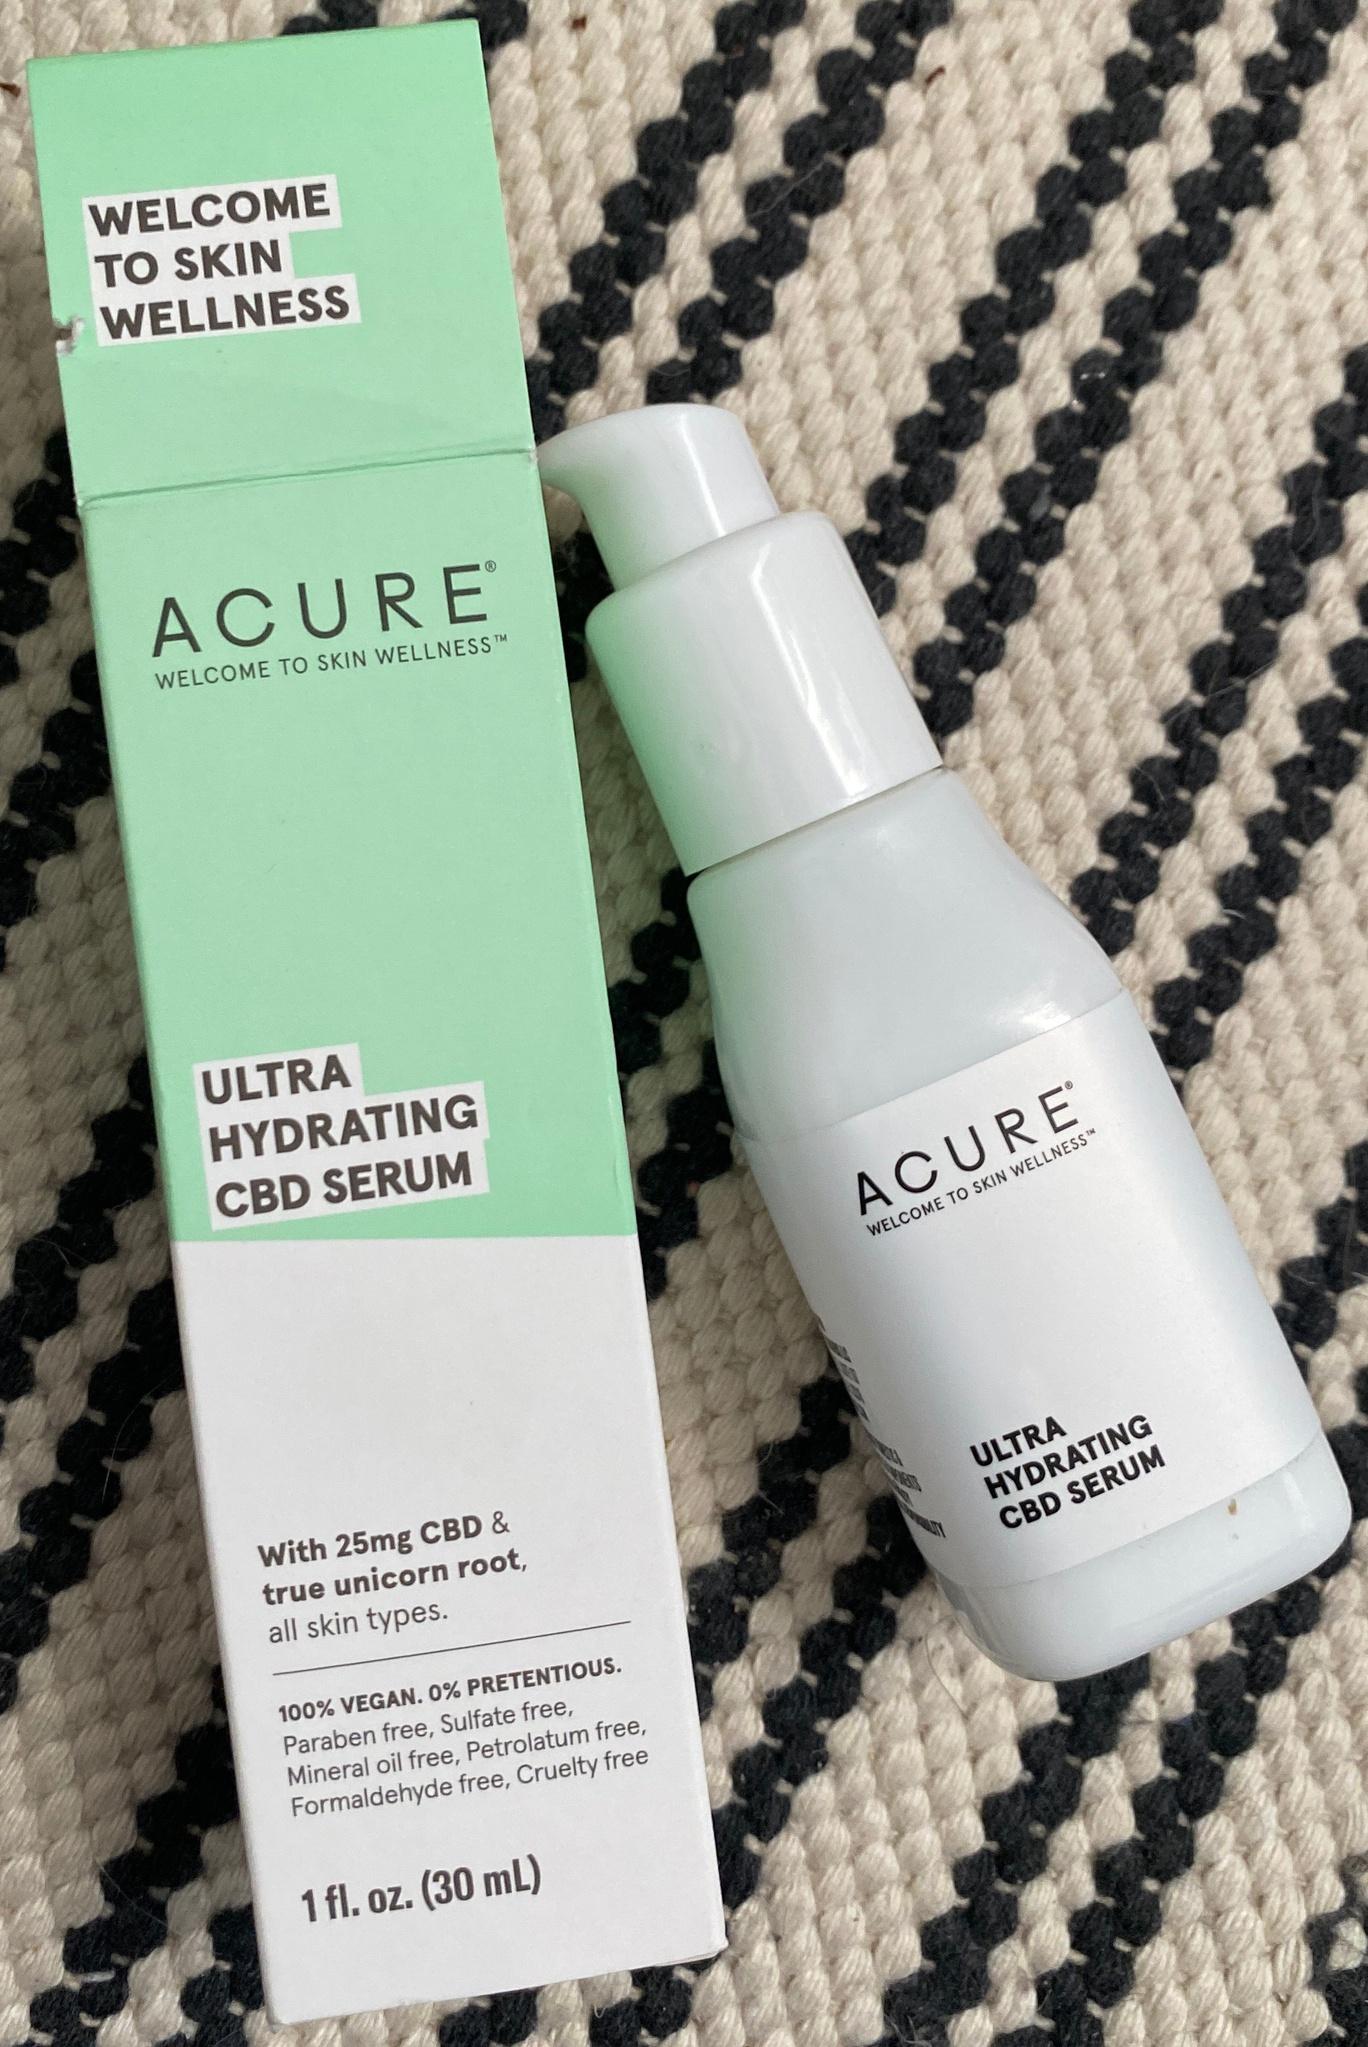 Acure Ultra Hydrating CBD Serum